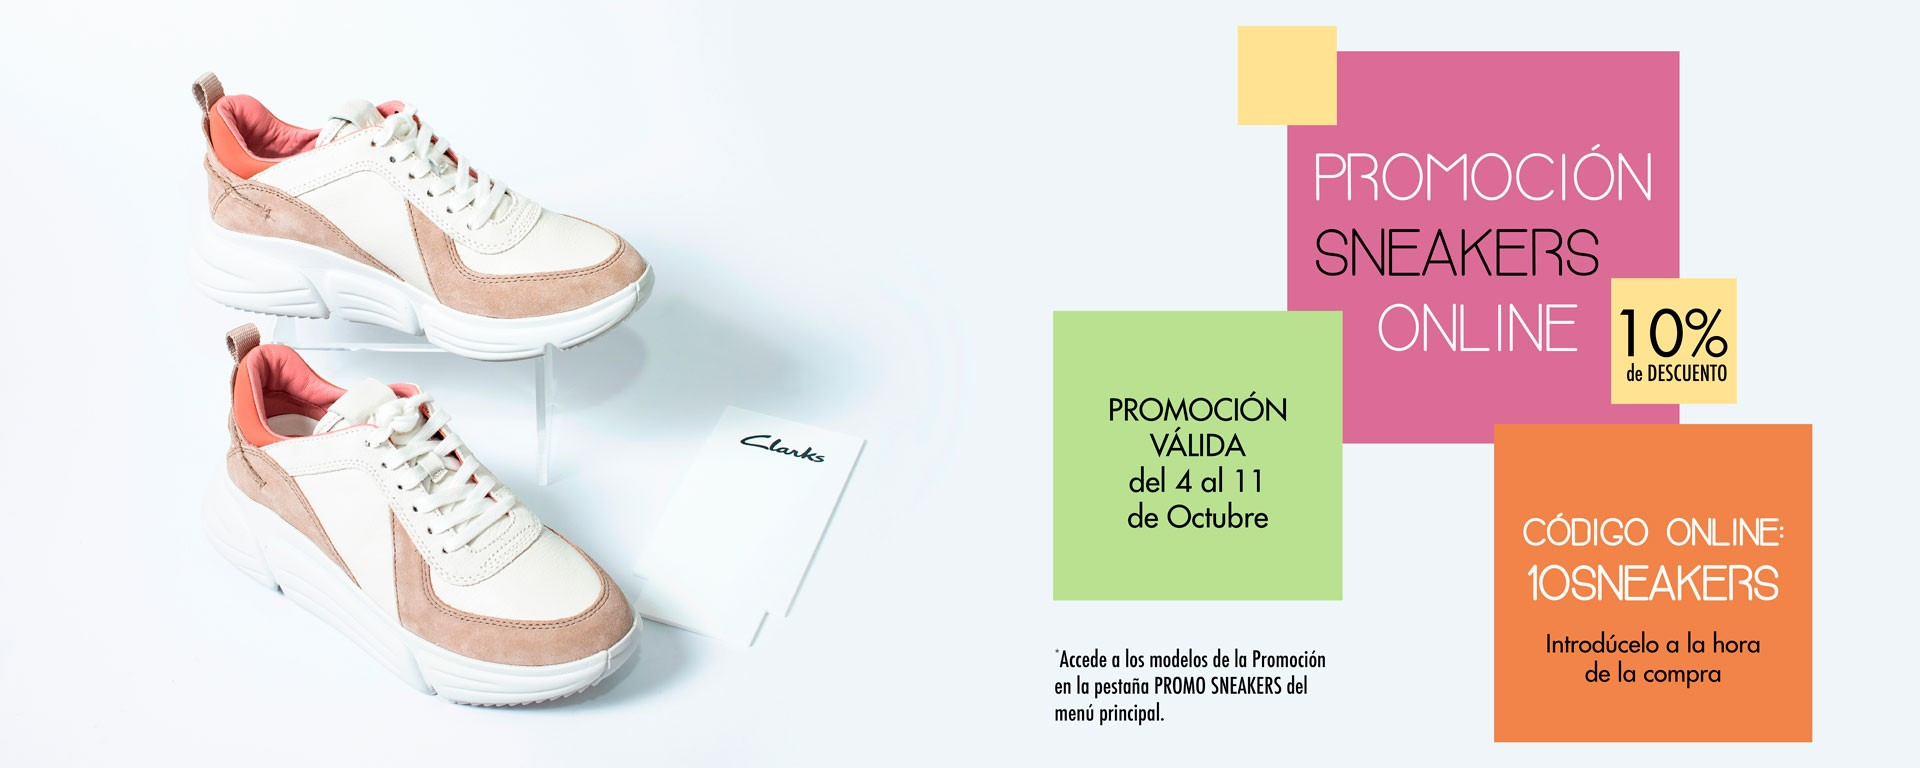 Promo-sneakers-hombre